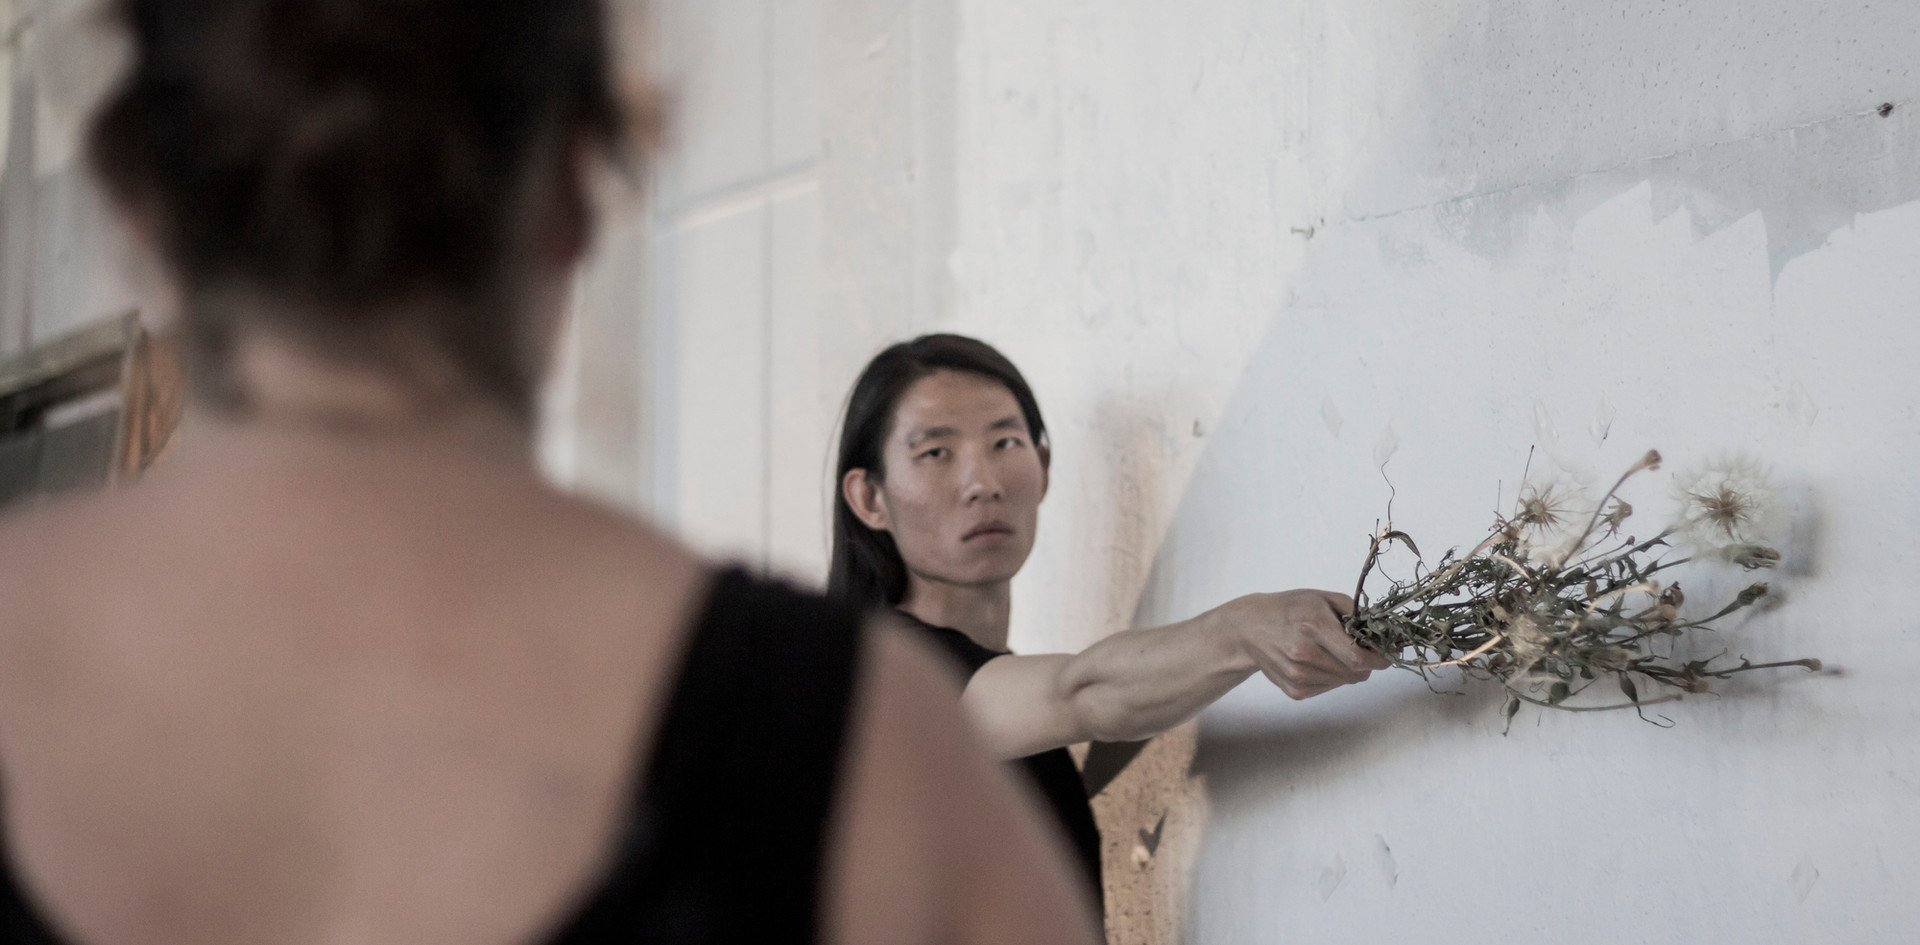 Project ID, Den Haag, 2019 © Fenia Kotsopoulou